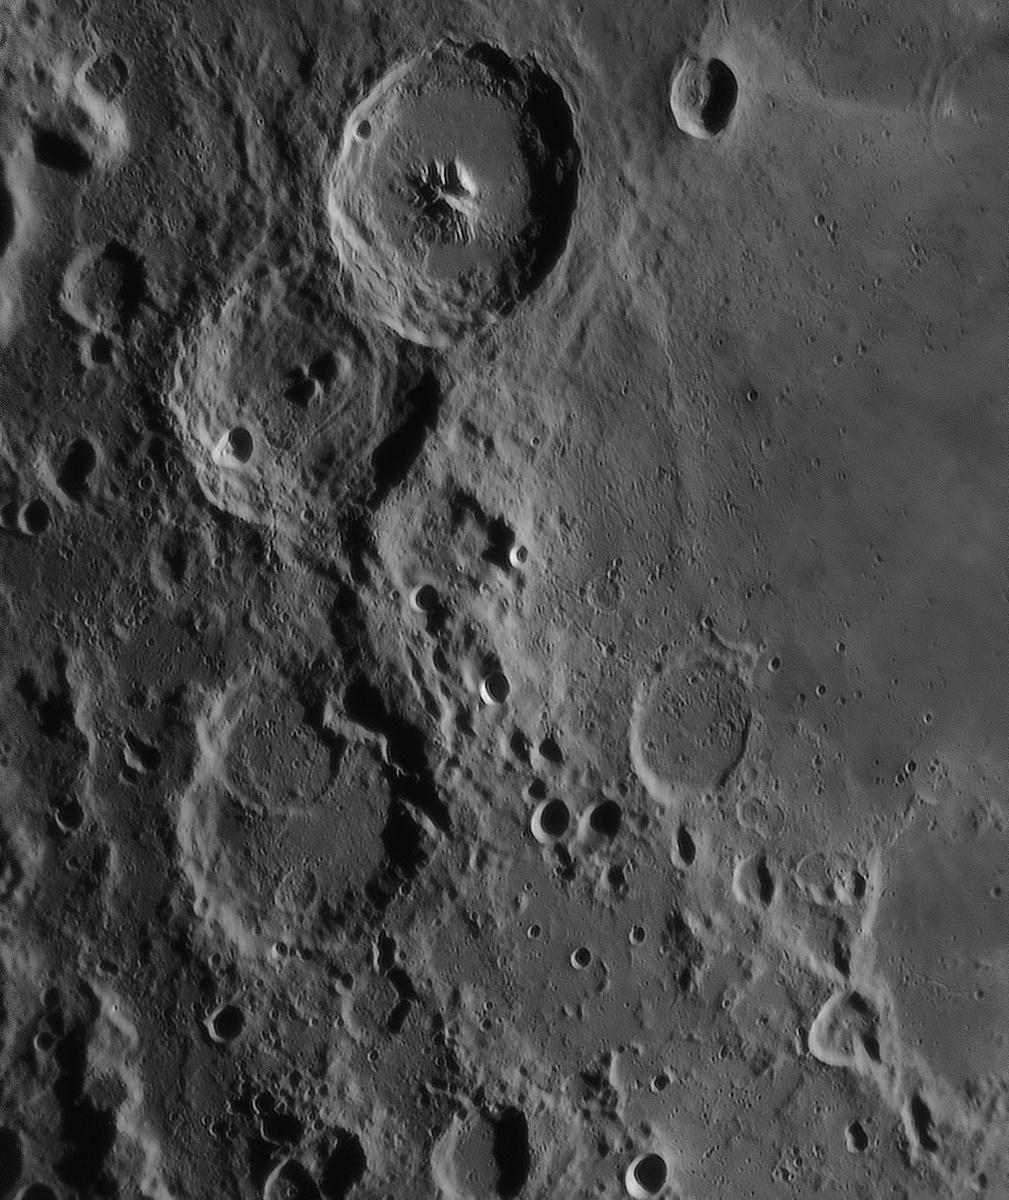 Theophilus, Cyrillus Catharina 20190510_193548_g4_ap467_conv.jpg